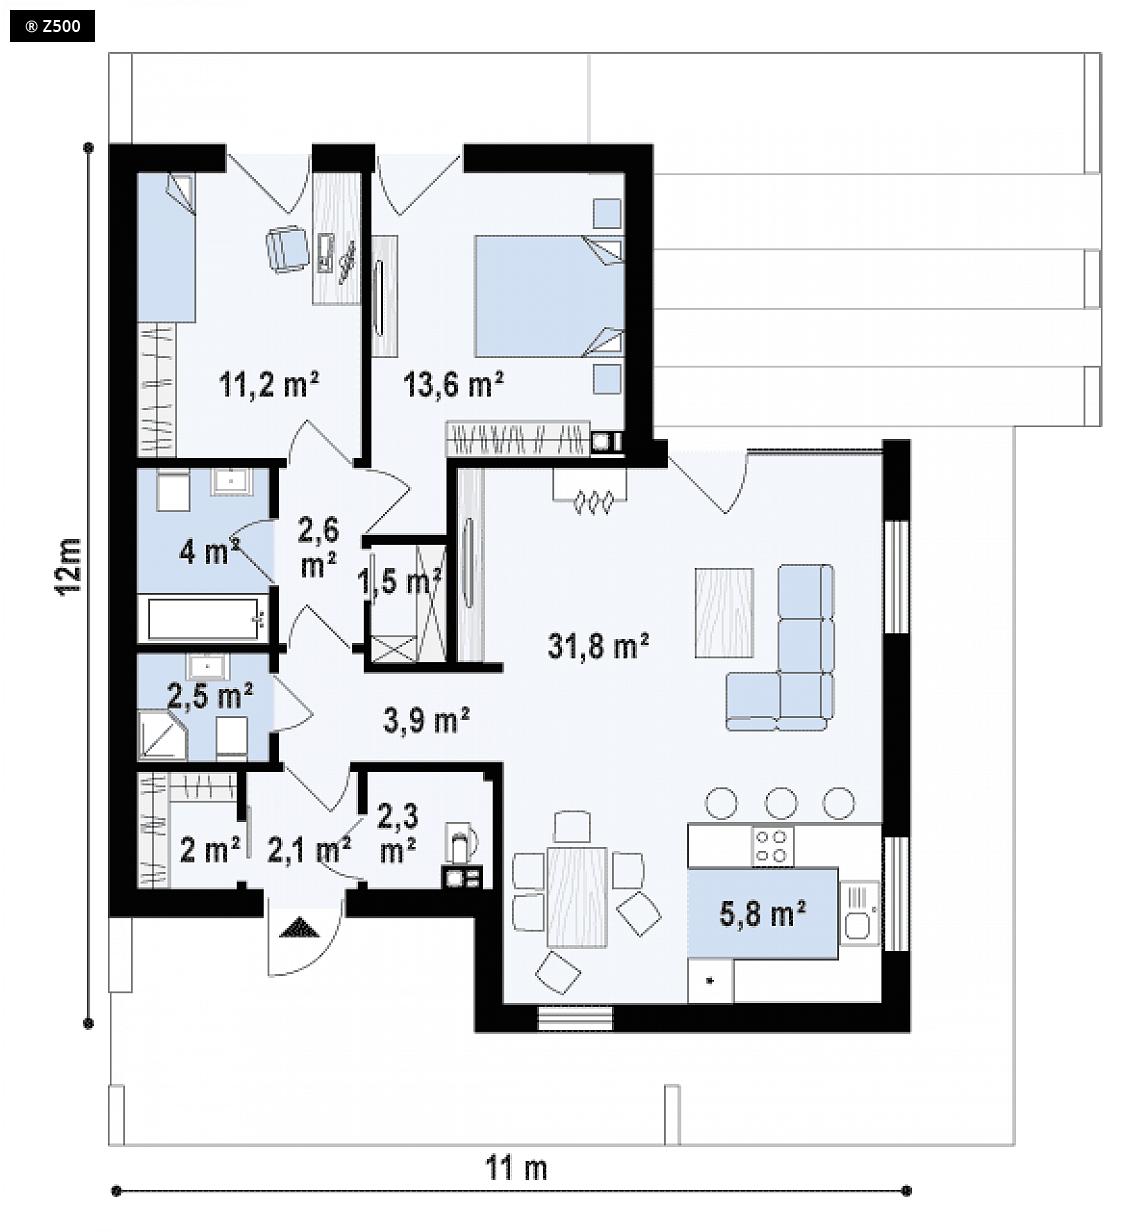 Proyectos de casas casa cadiz moderna de playa - Planos de casas de planta baja ...